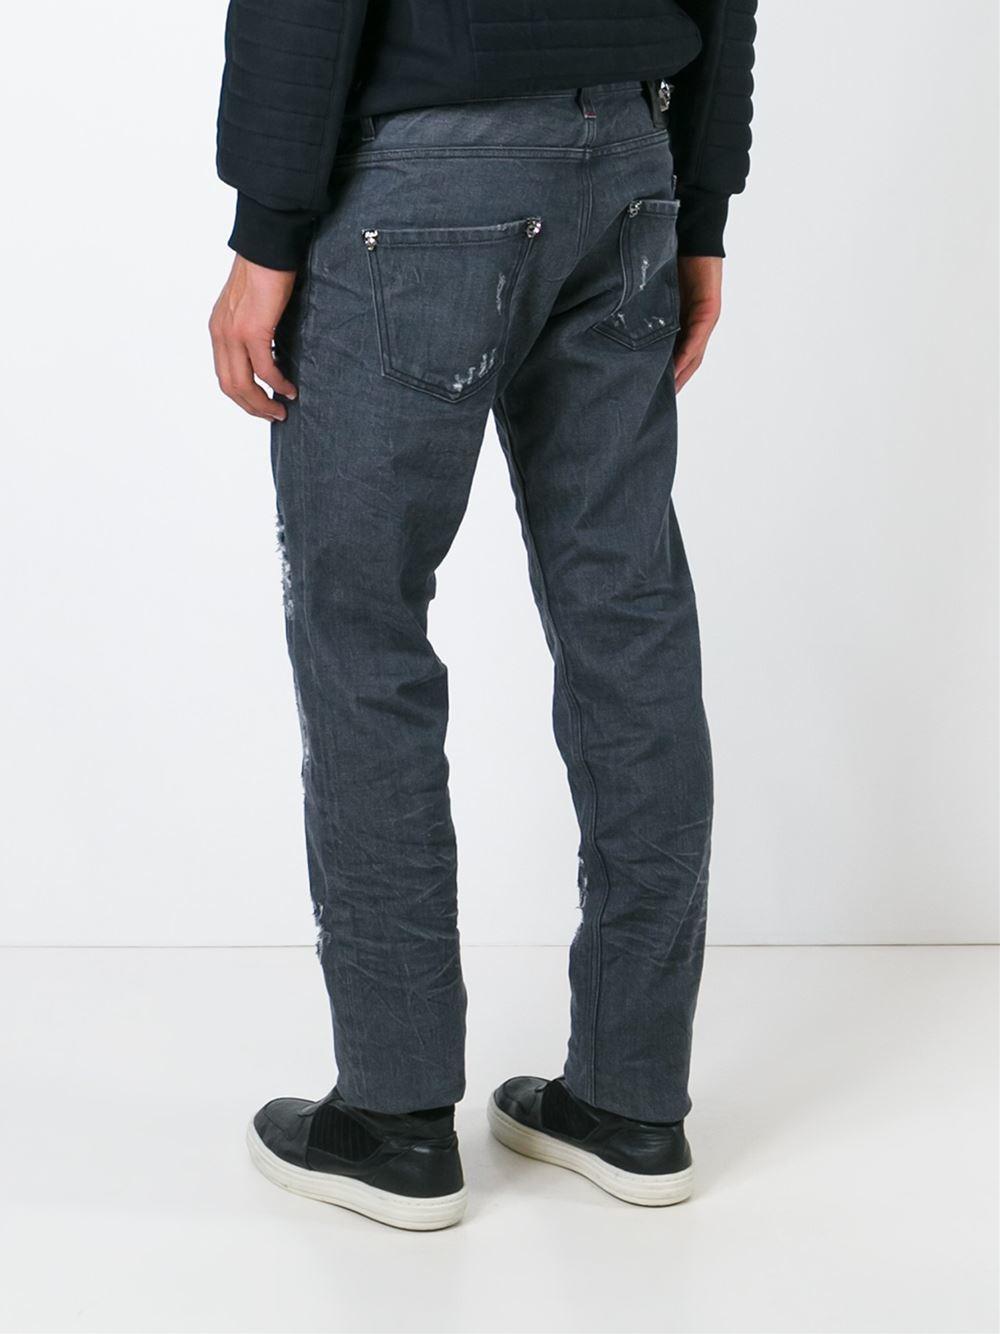 philipp plein distressed straight leg jeans in blue for men grey lyst. Black Bedroom Furniture Sets. Home Design Ideas